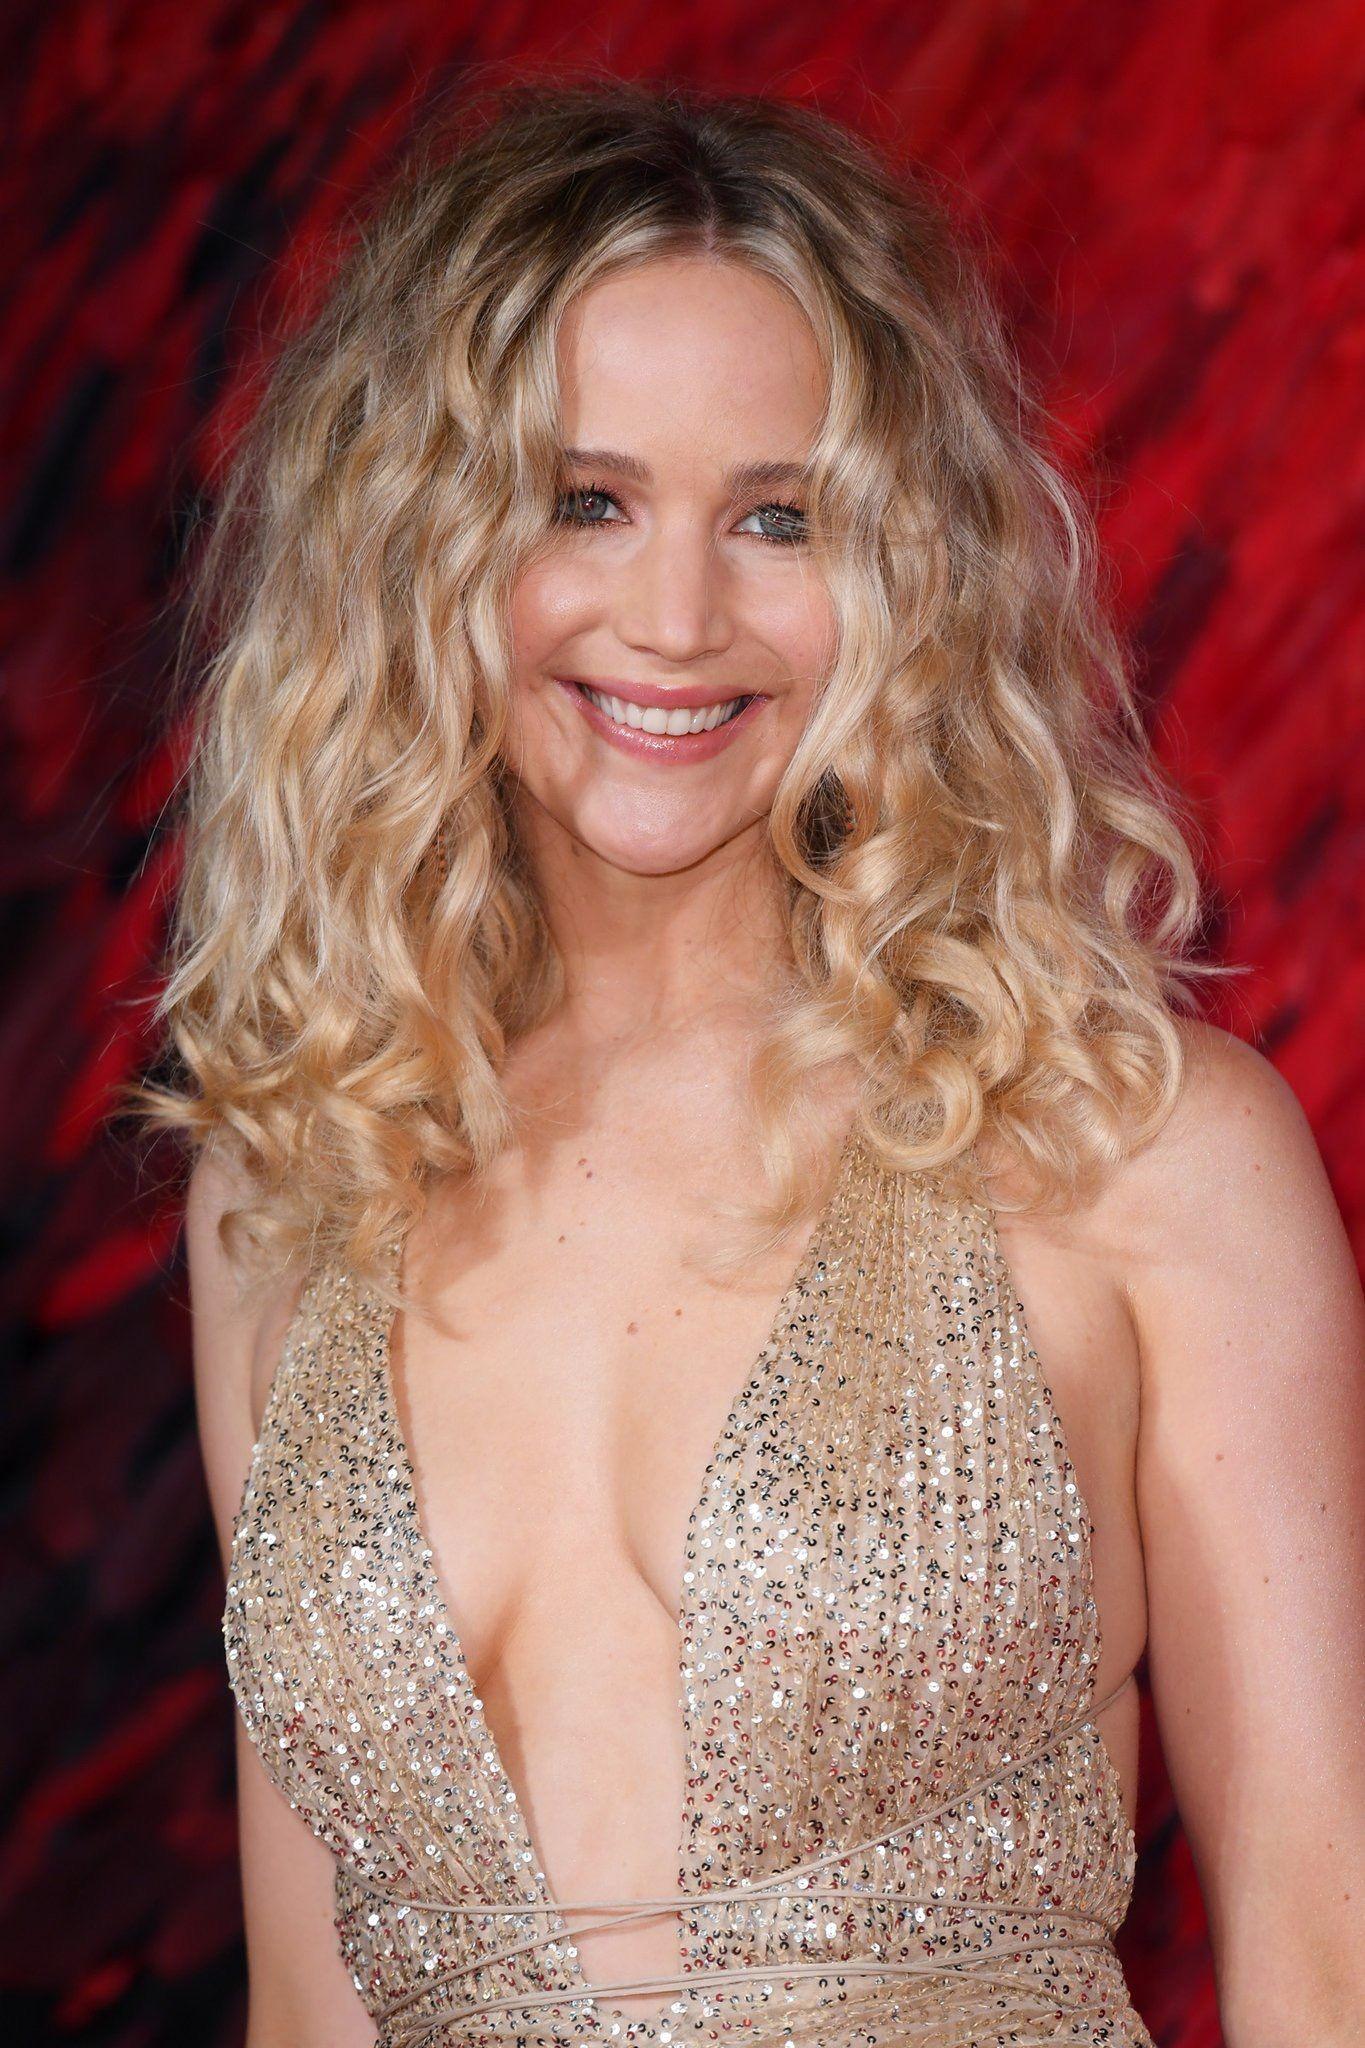 Jennifer Lawrences Red Sparrow Premiere Gown Was Fit